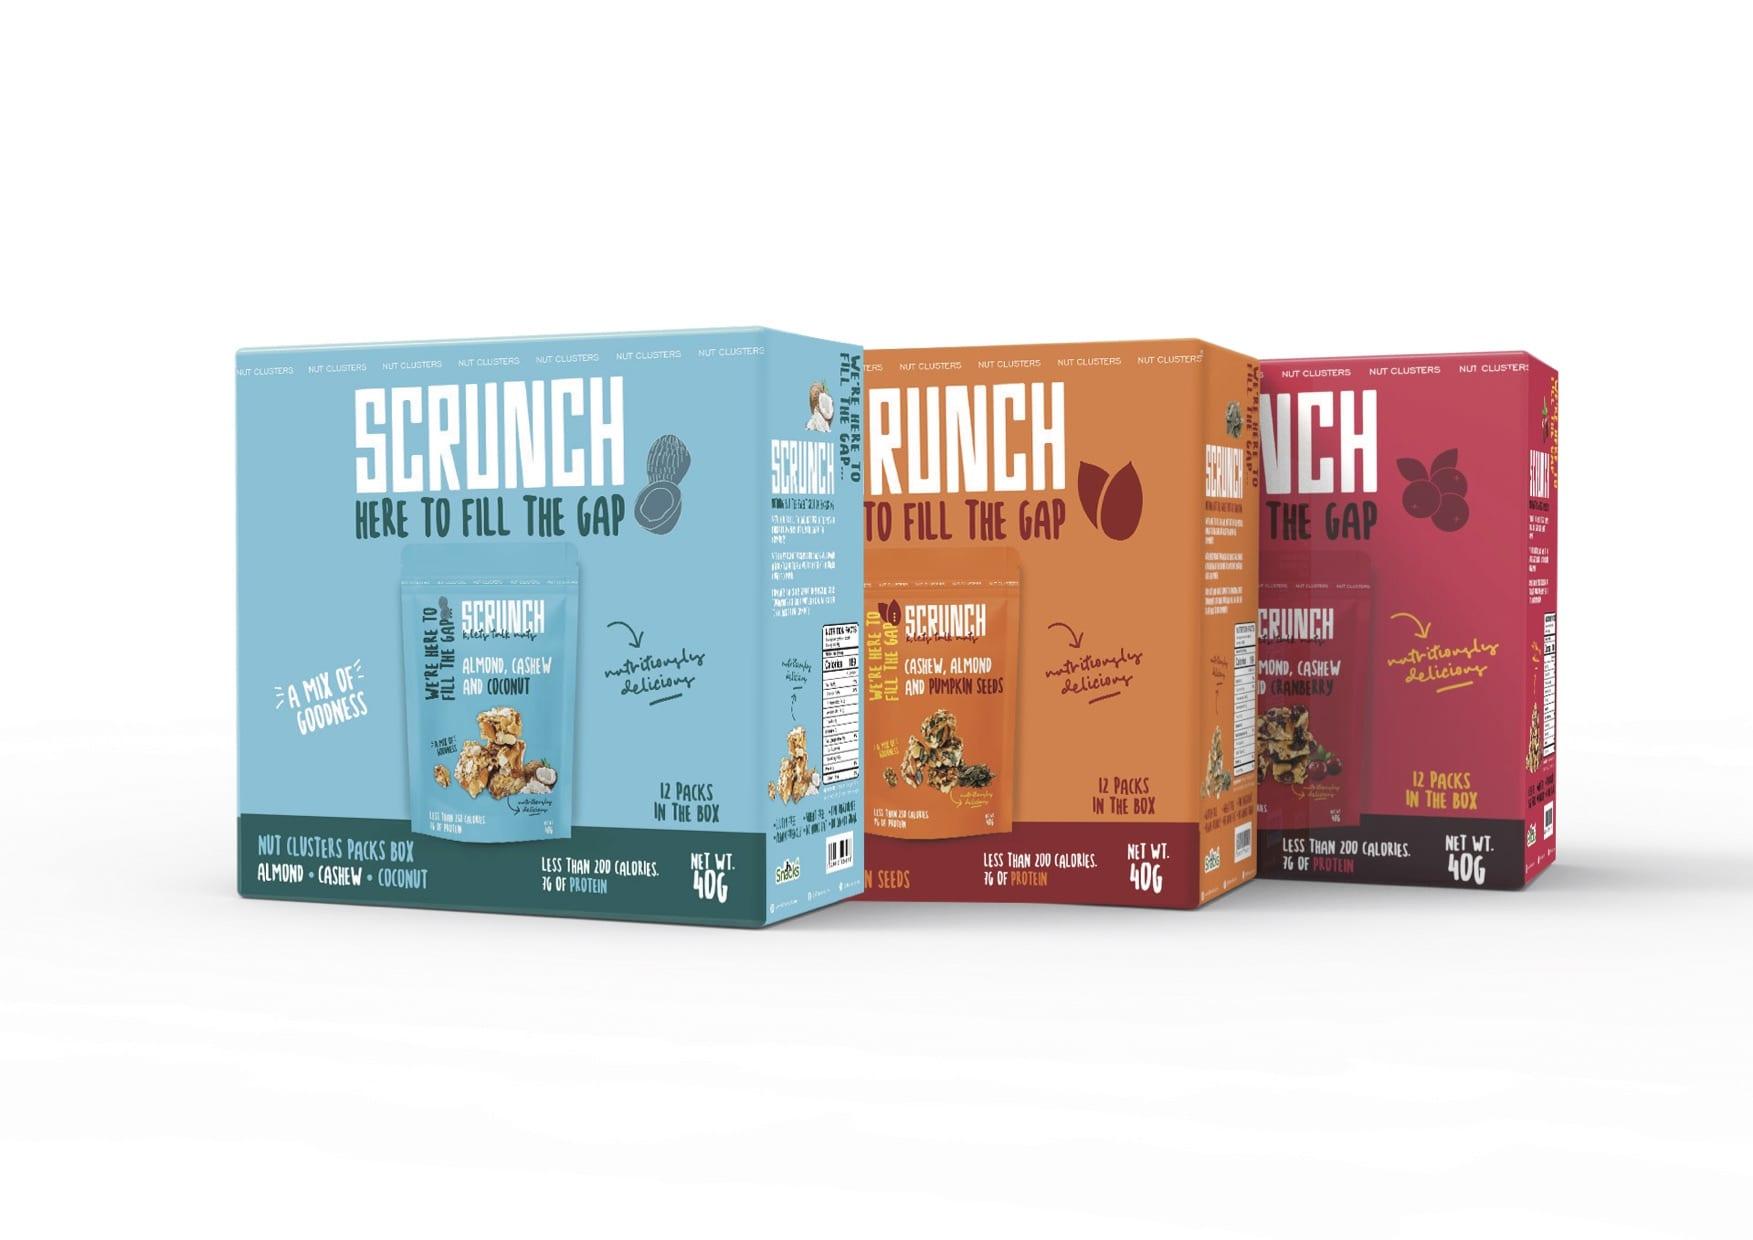 Scrunch Box Packaging 24.03.2020